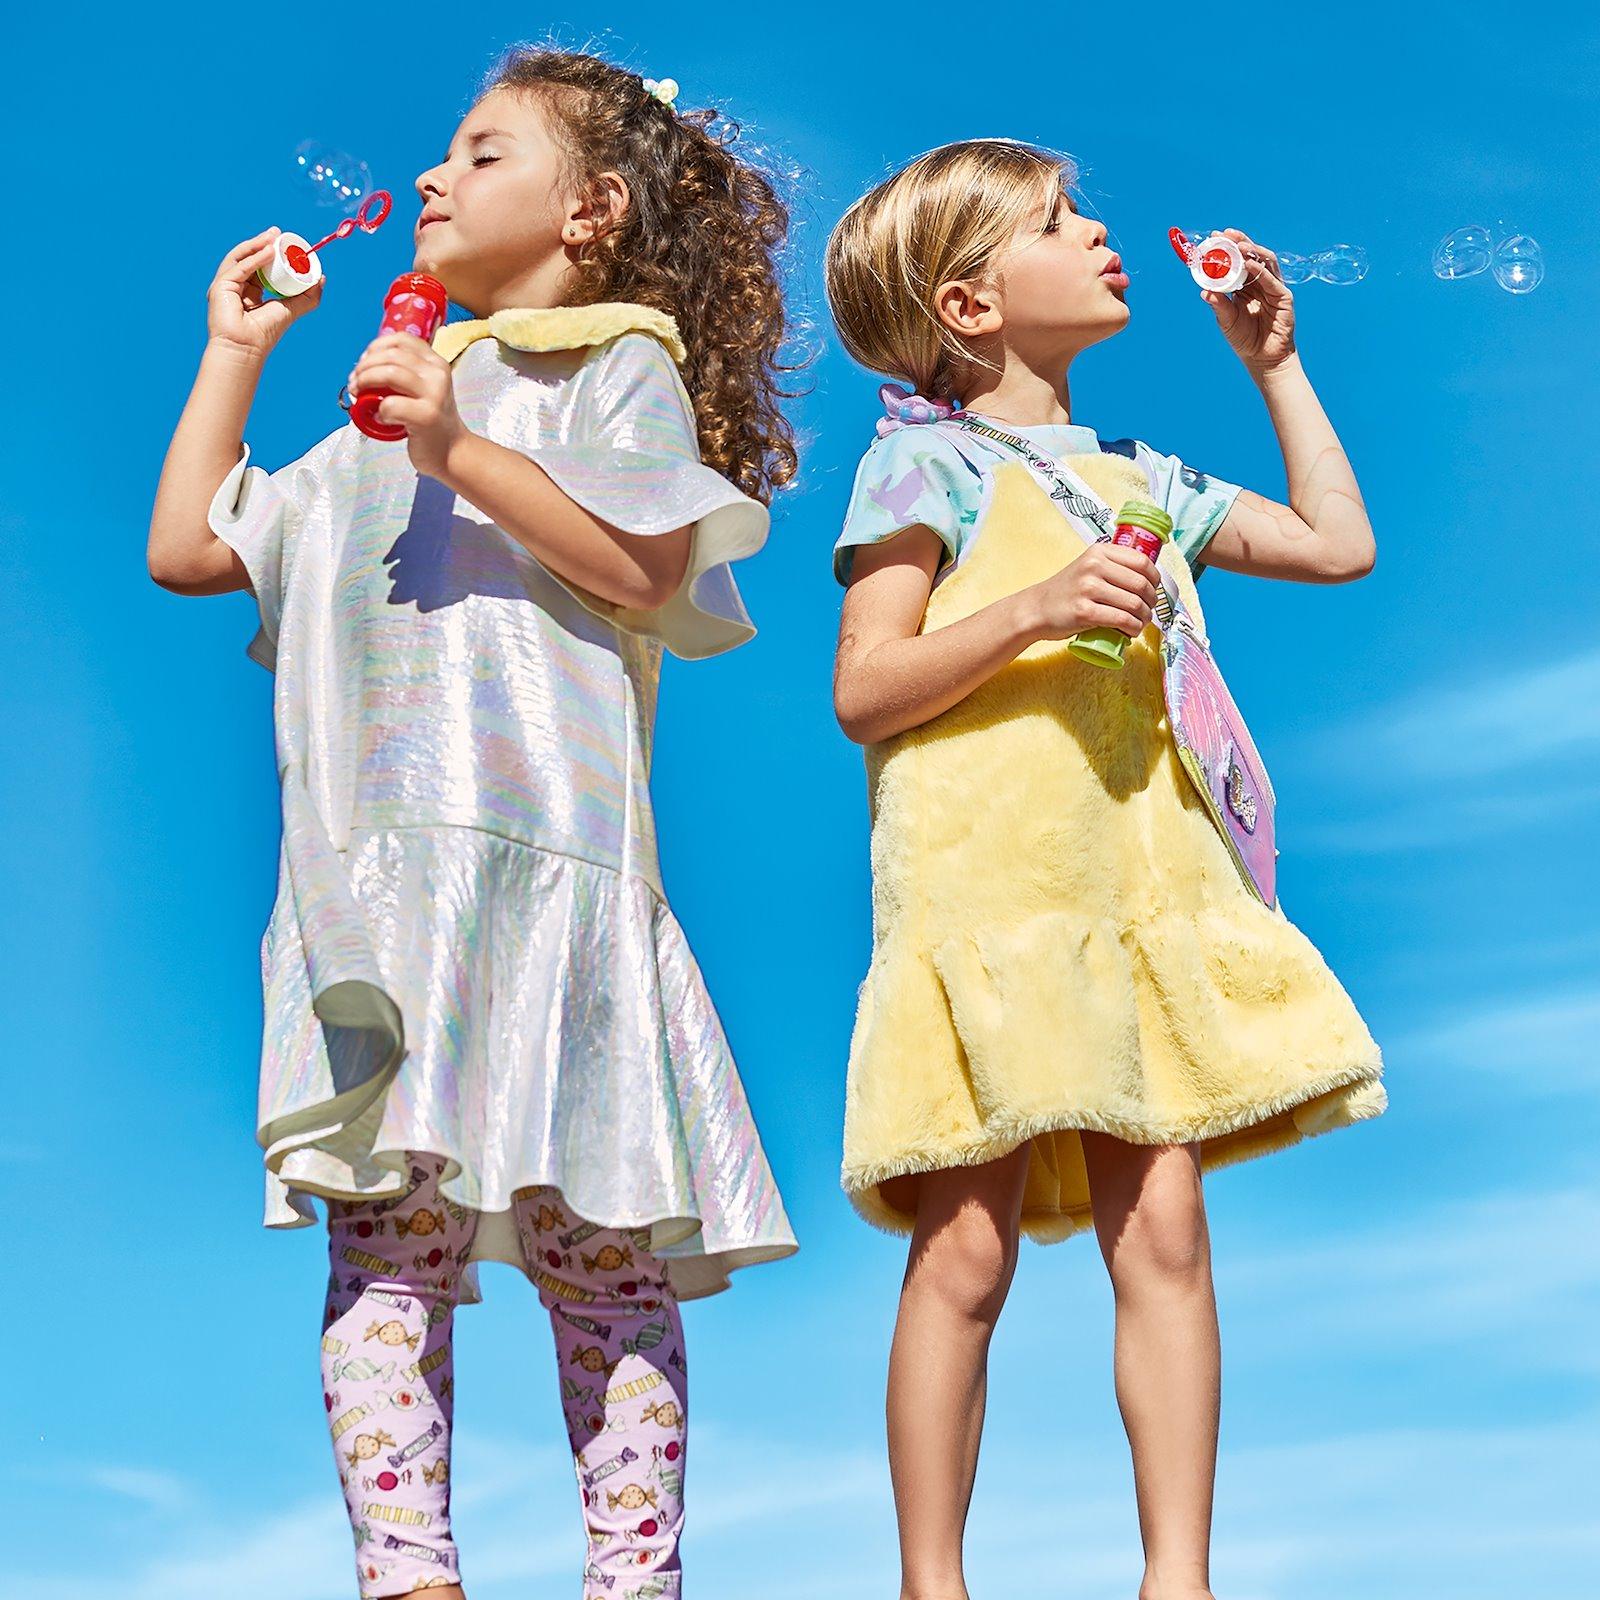 Organic stretch jersey blue w unicorn p65021_272678_p63062_910283_p90328_824045_82409_26523_bundle